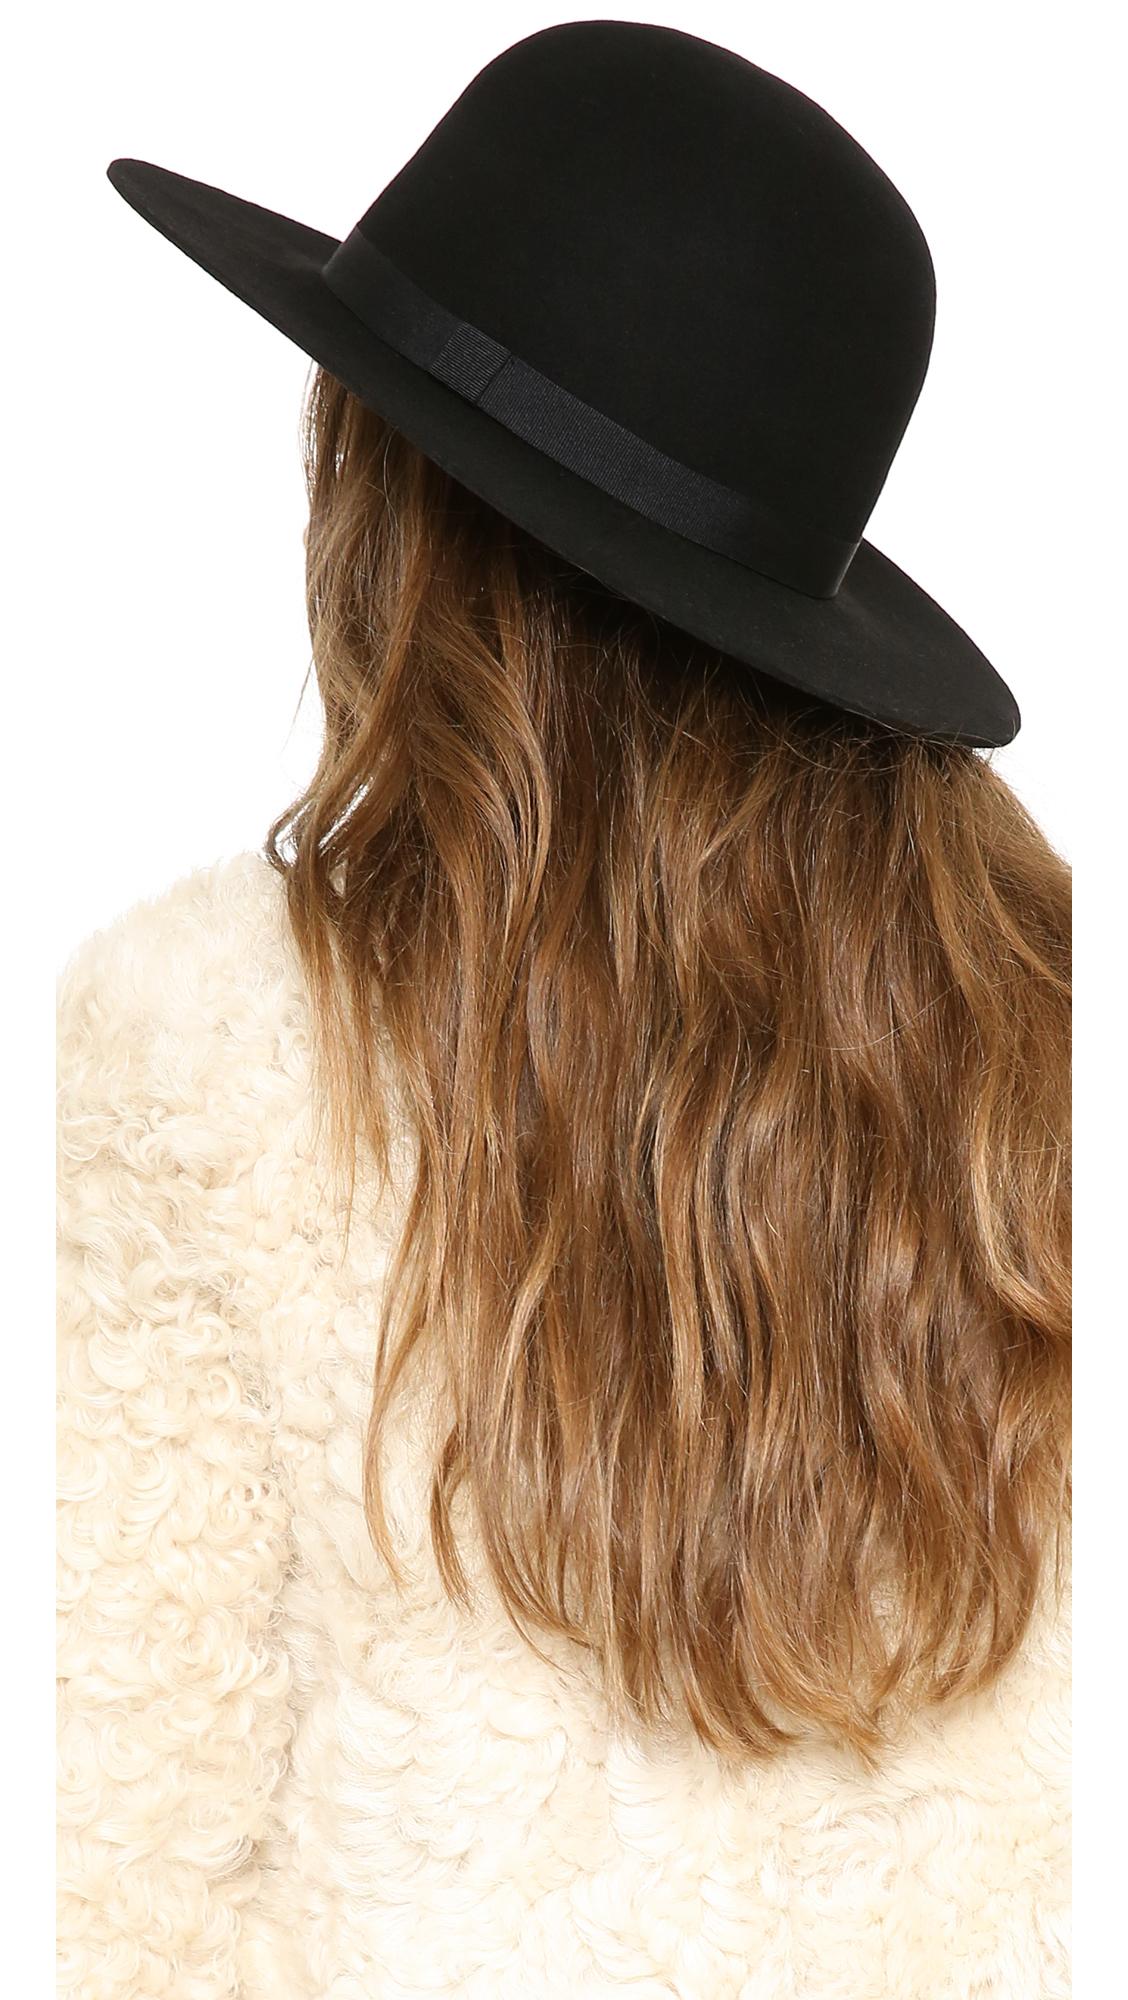 Lyst - Brixton Colton Hat in Black 4948d3fe476